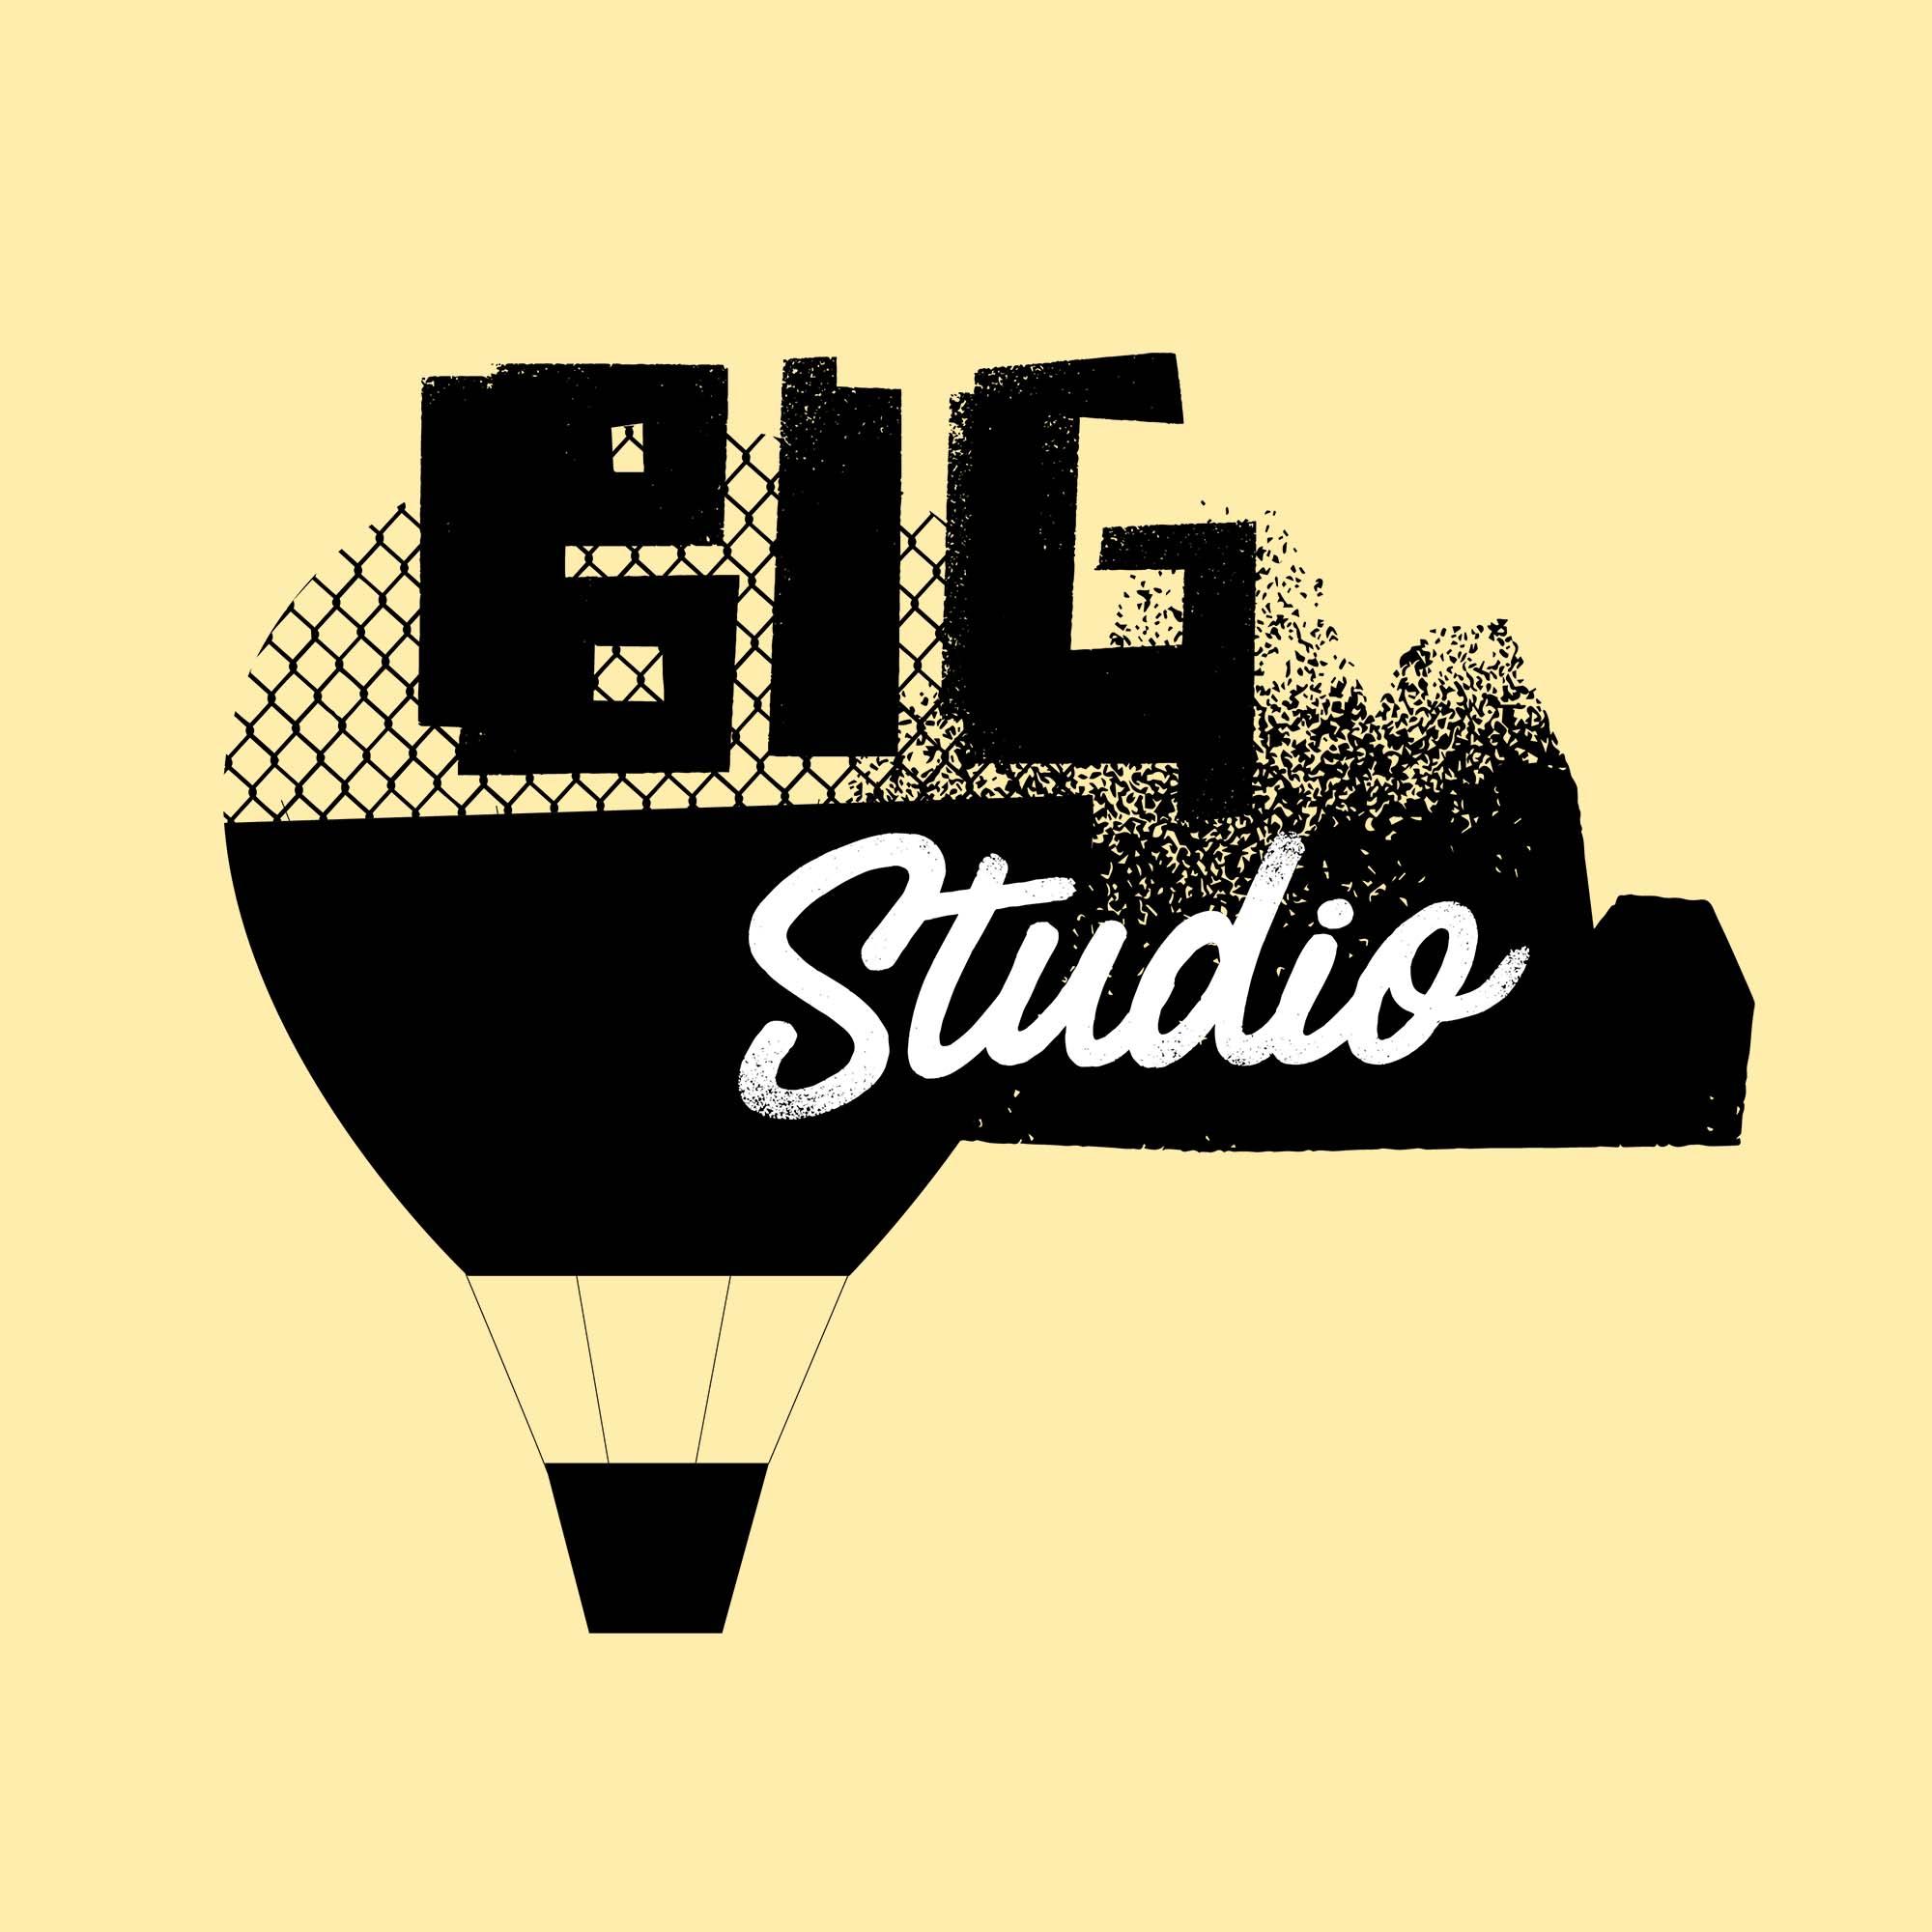 HAWK_2019Big Studio ballon plain.jpg